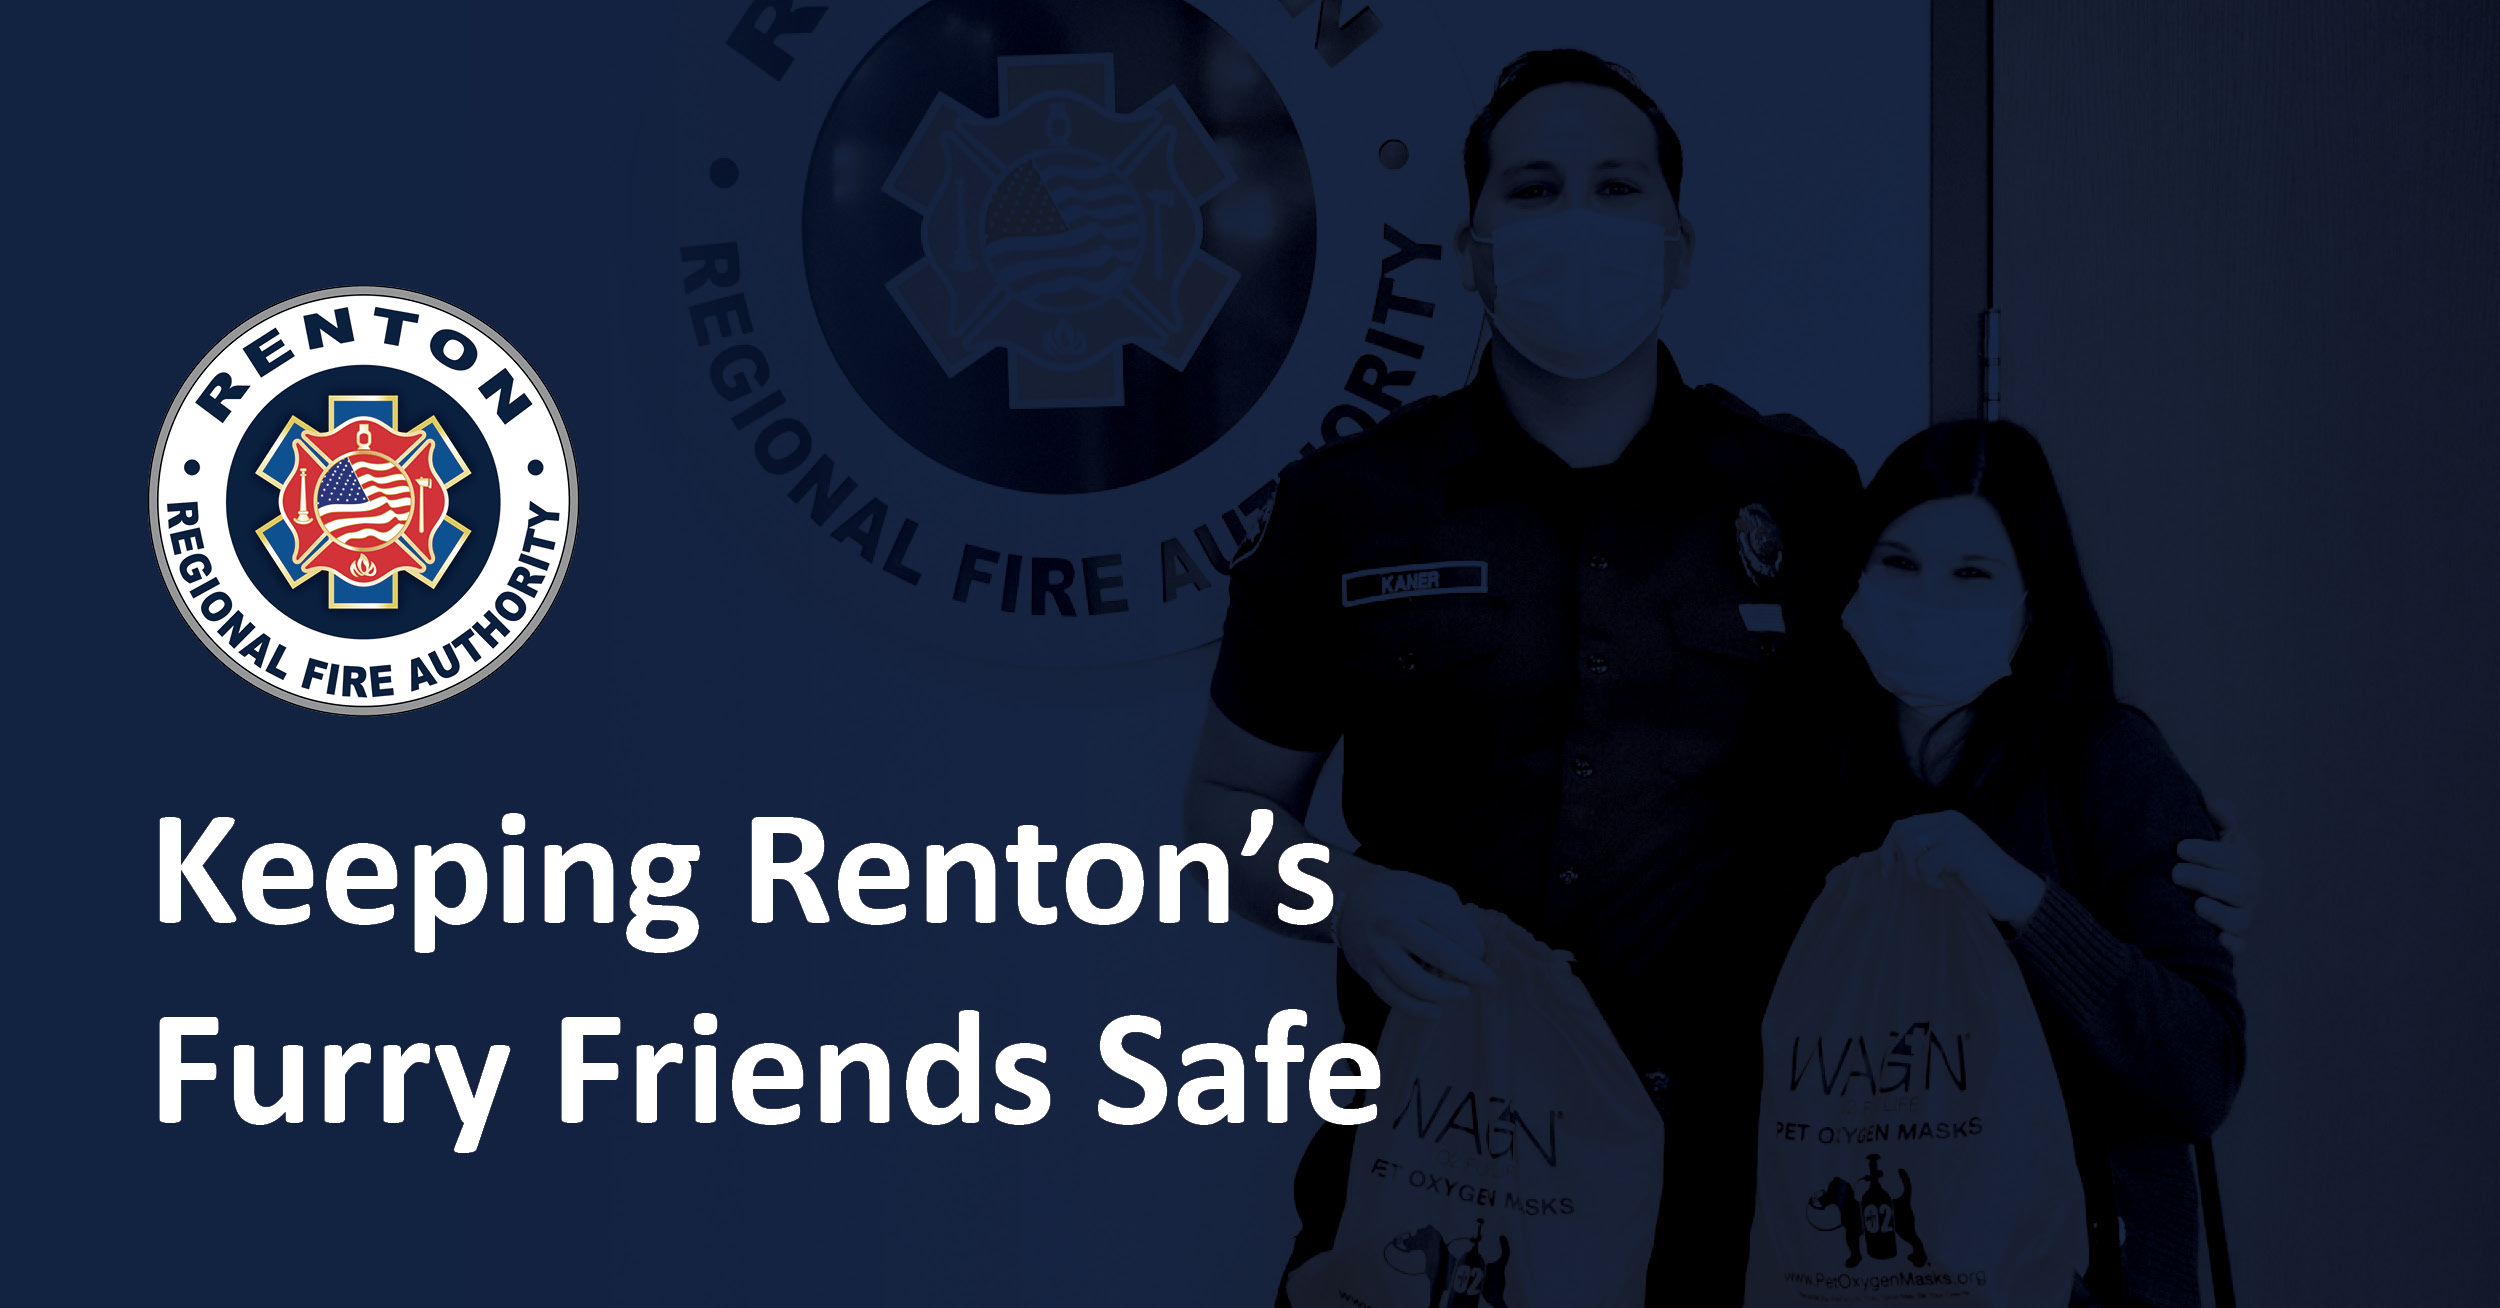 Keeping Renton's Furry Friends Safe